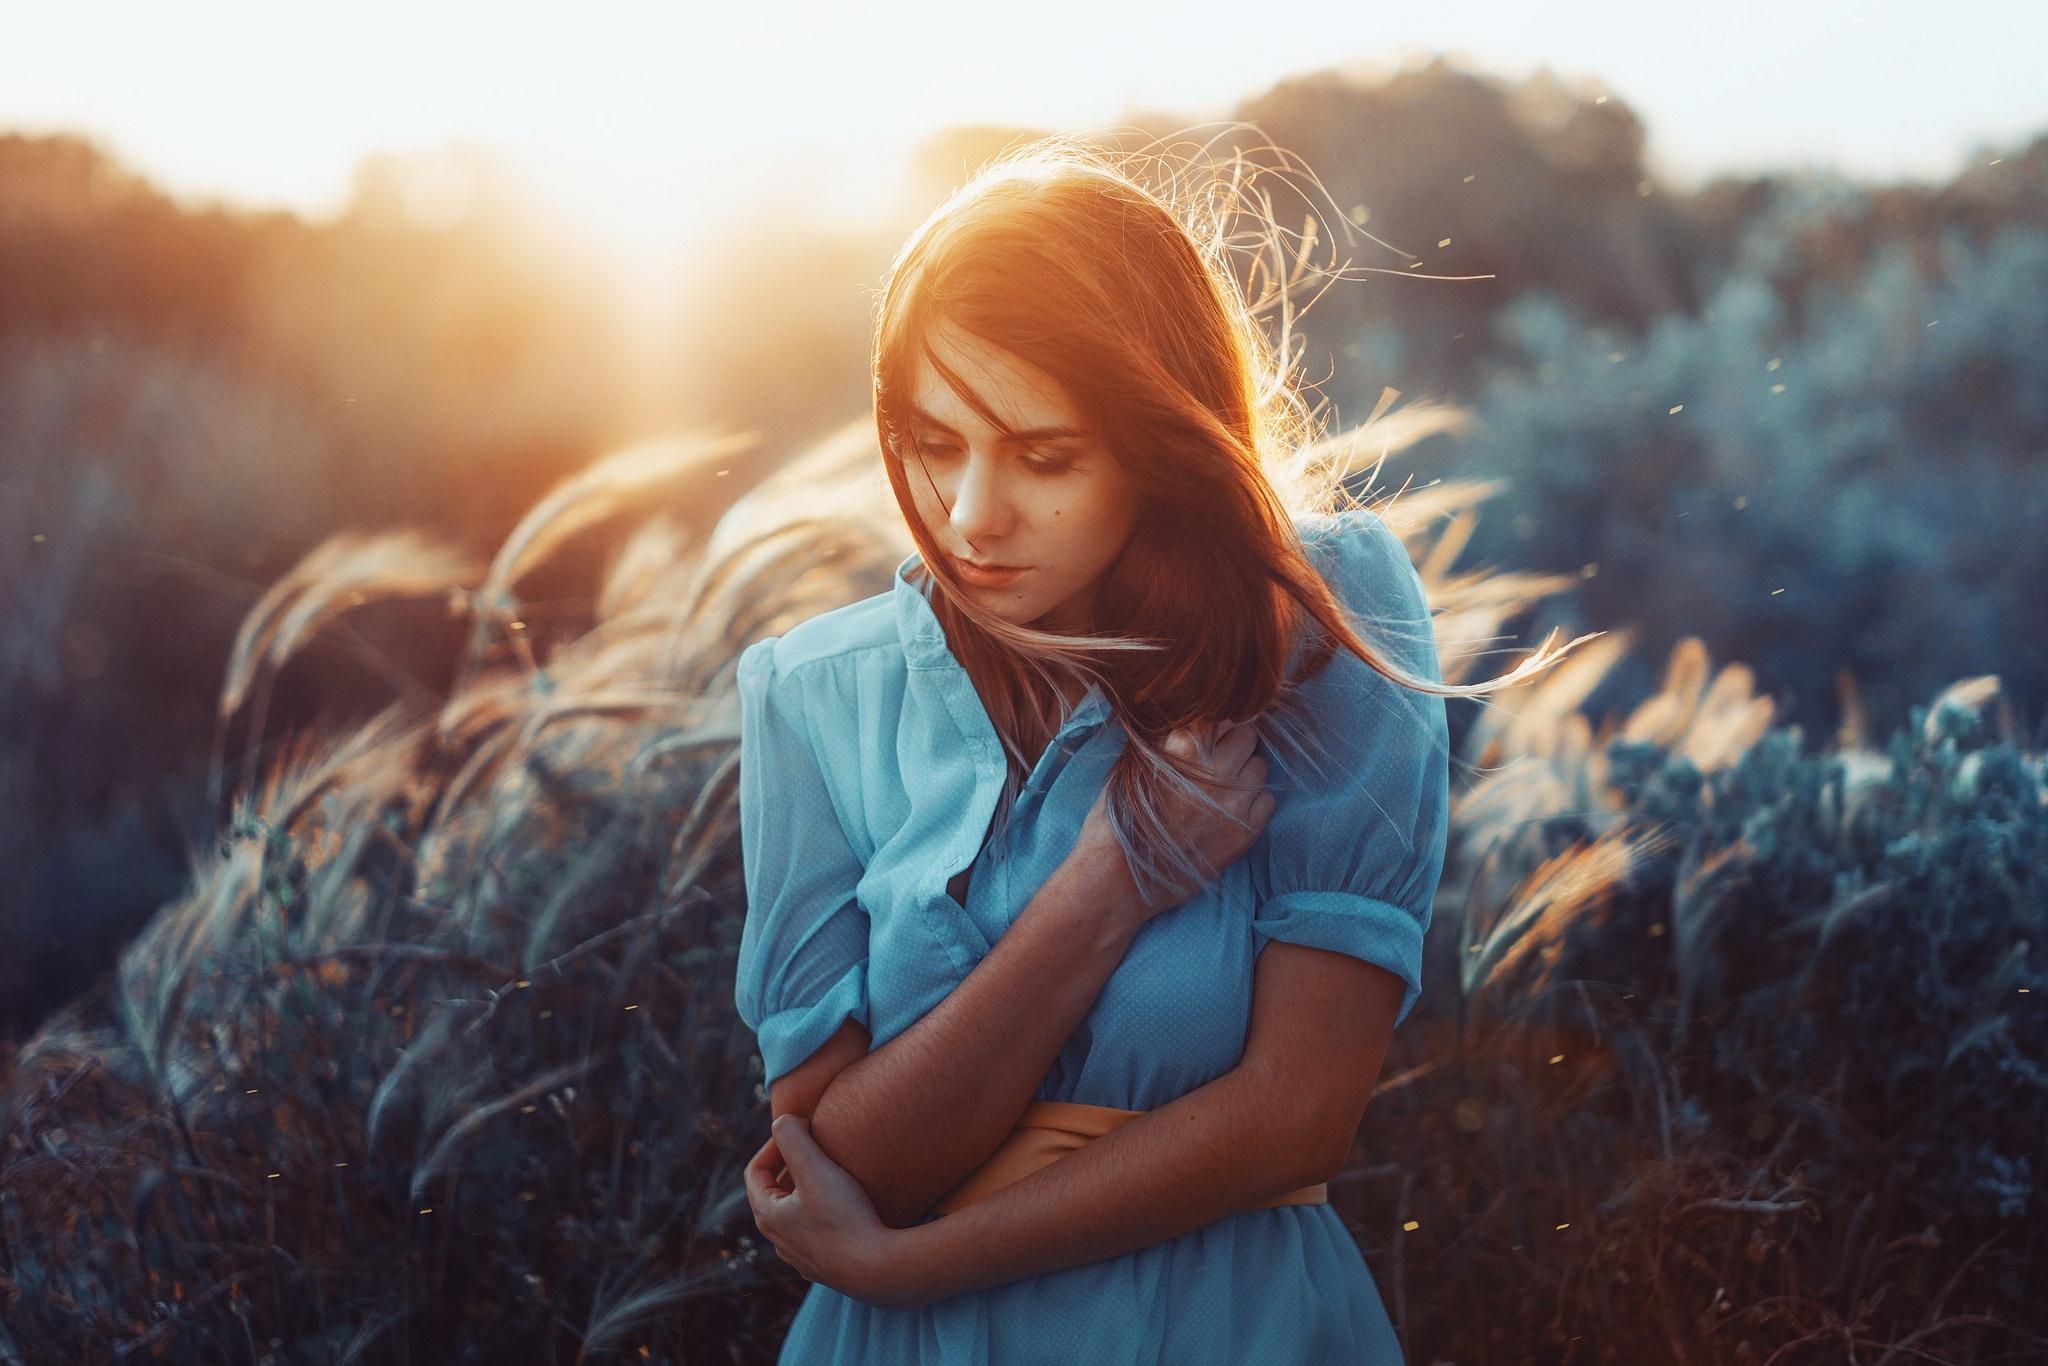 Blue Dress Depth Of Field Girl Model Mood Redhead Sunrise Woman 2048x1366